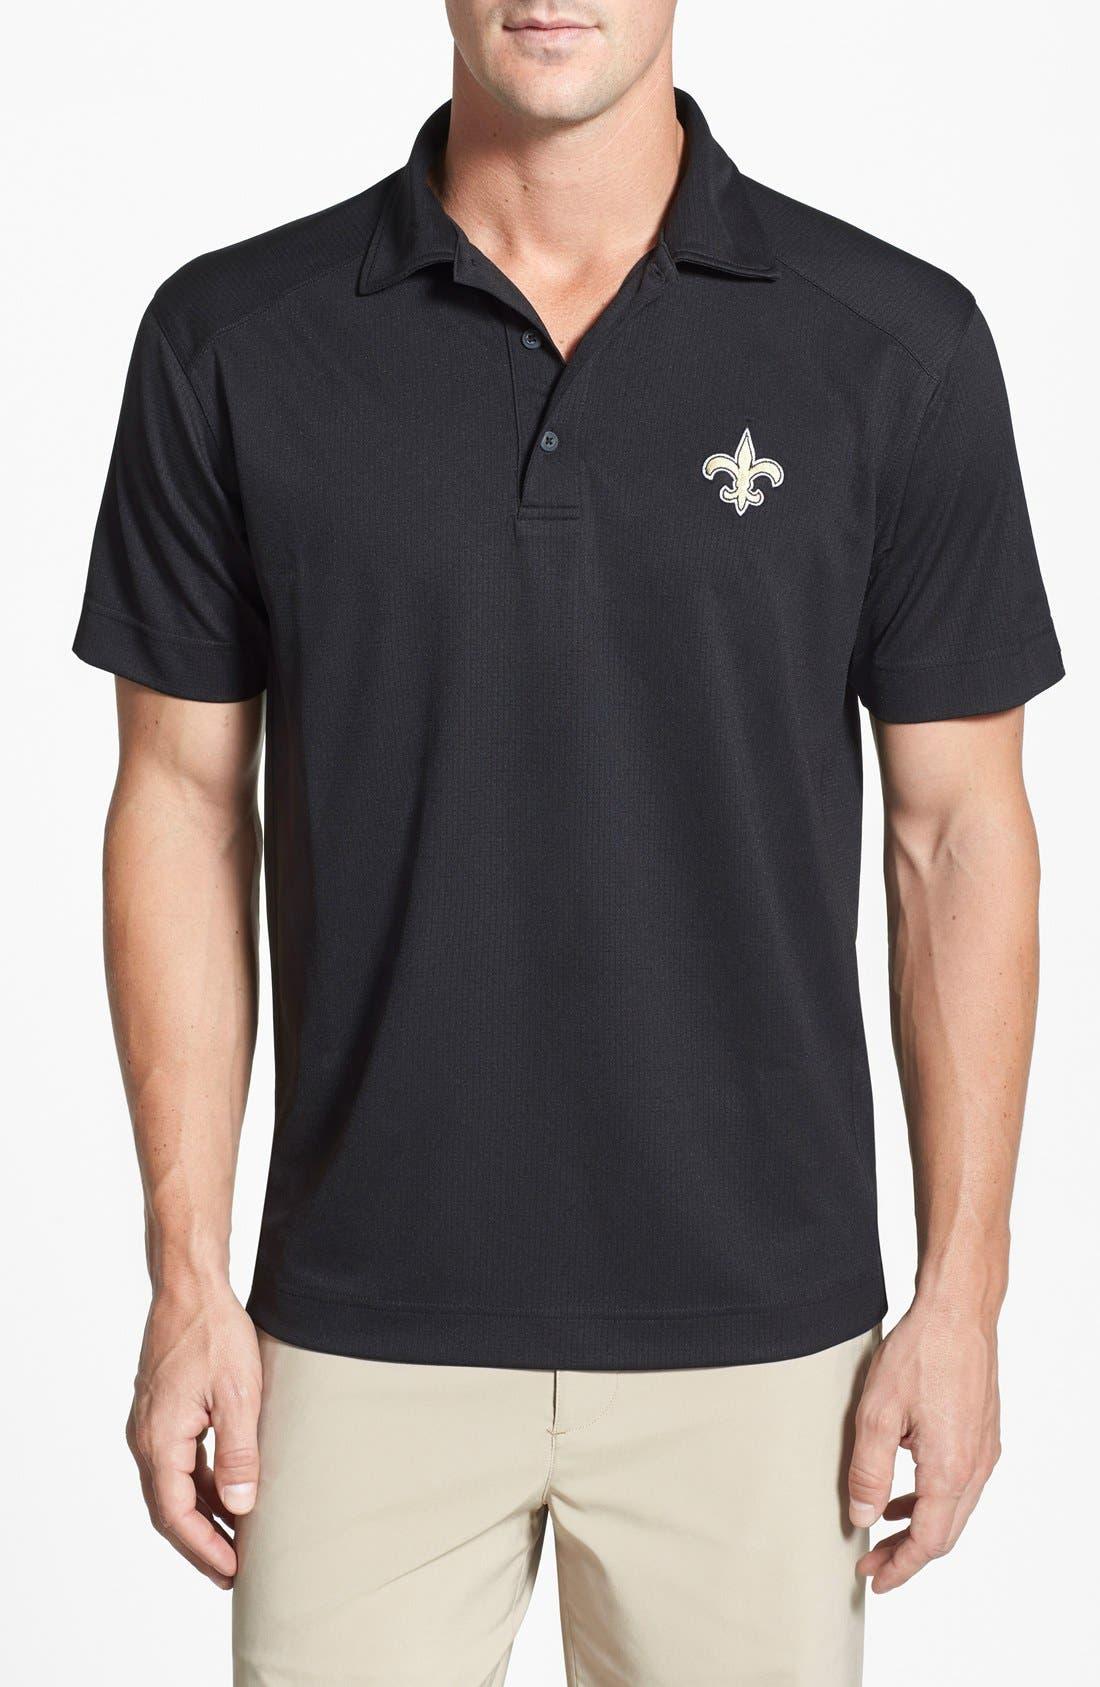 'New Orleans Saints - Genre' DryTec Moisture Wicking Polo,                         Main,                         color, Black